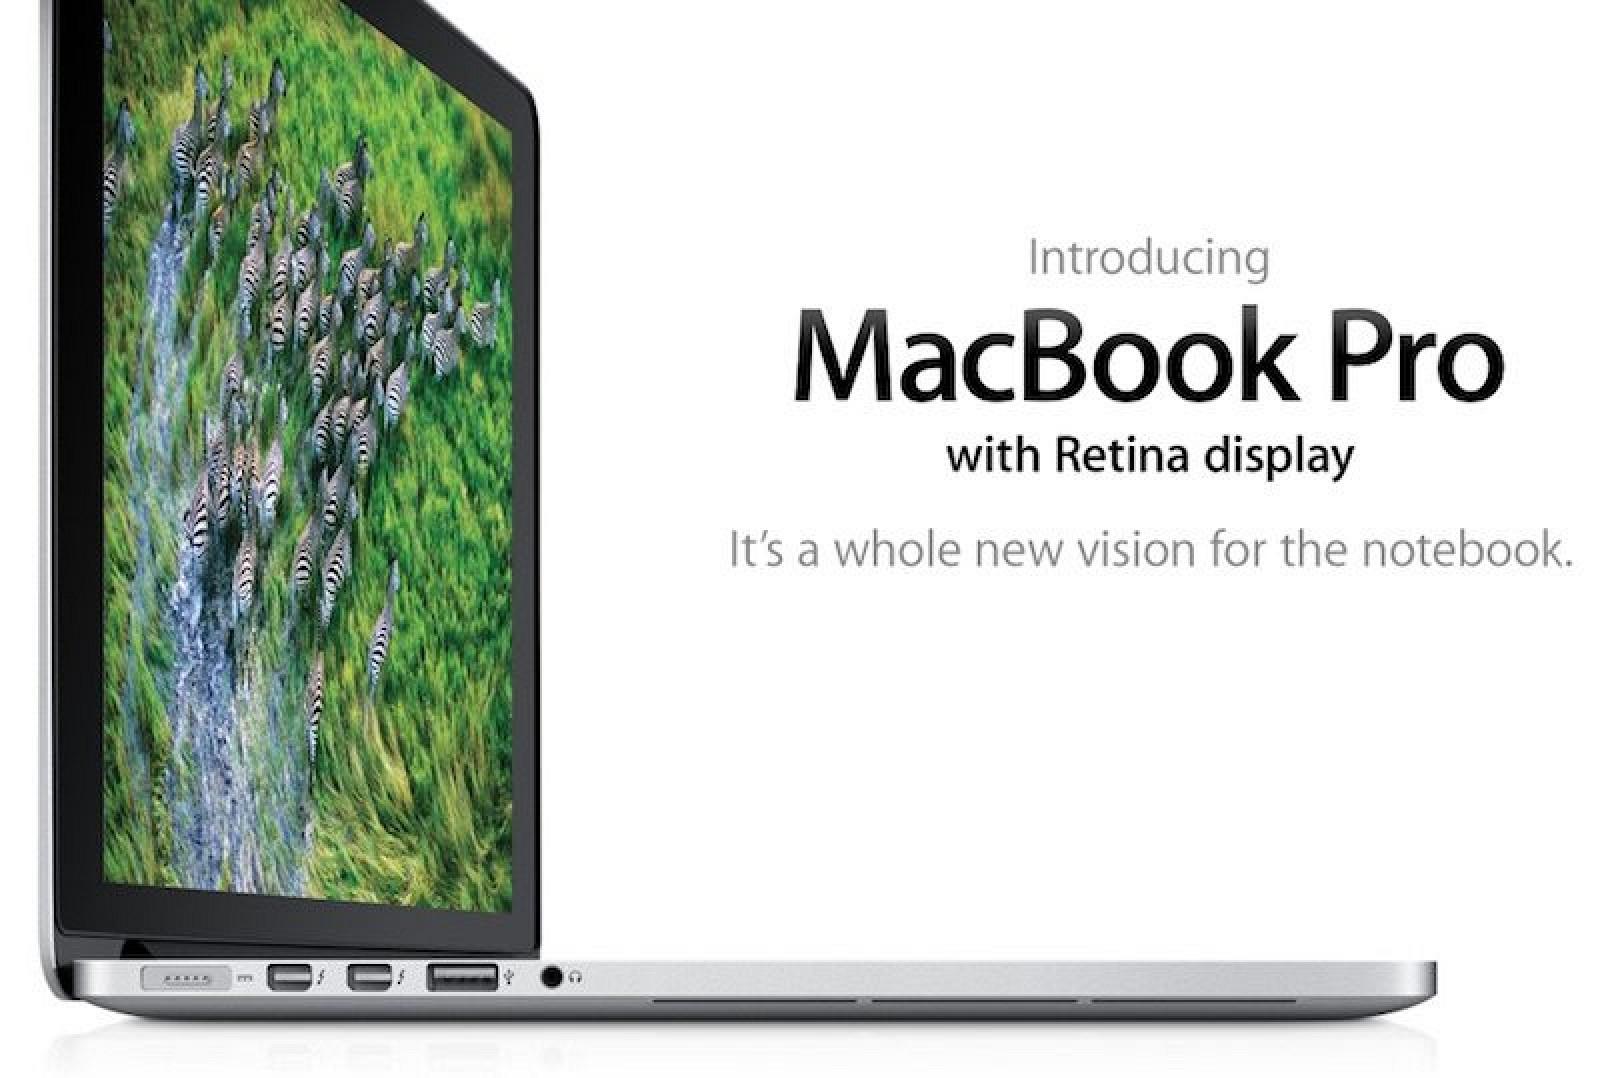 Apple's First MacBook Pro with Retina Display is Now 'Vintage'